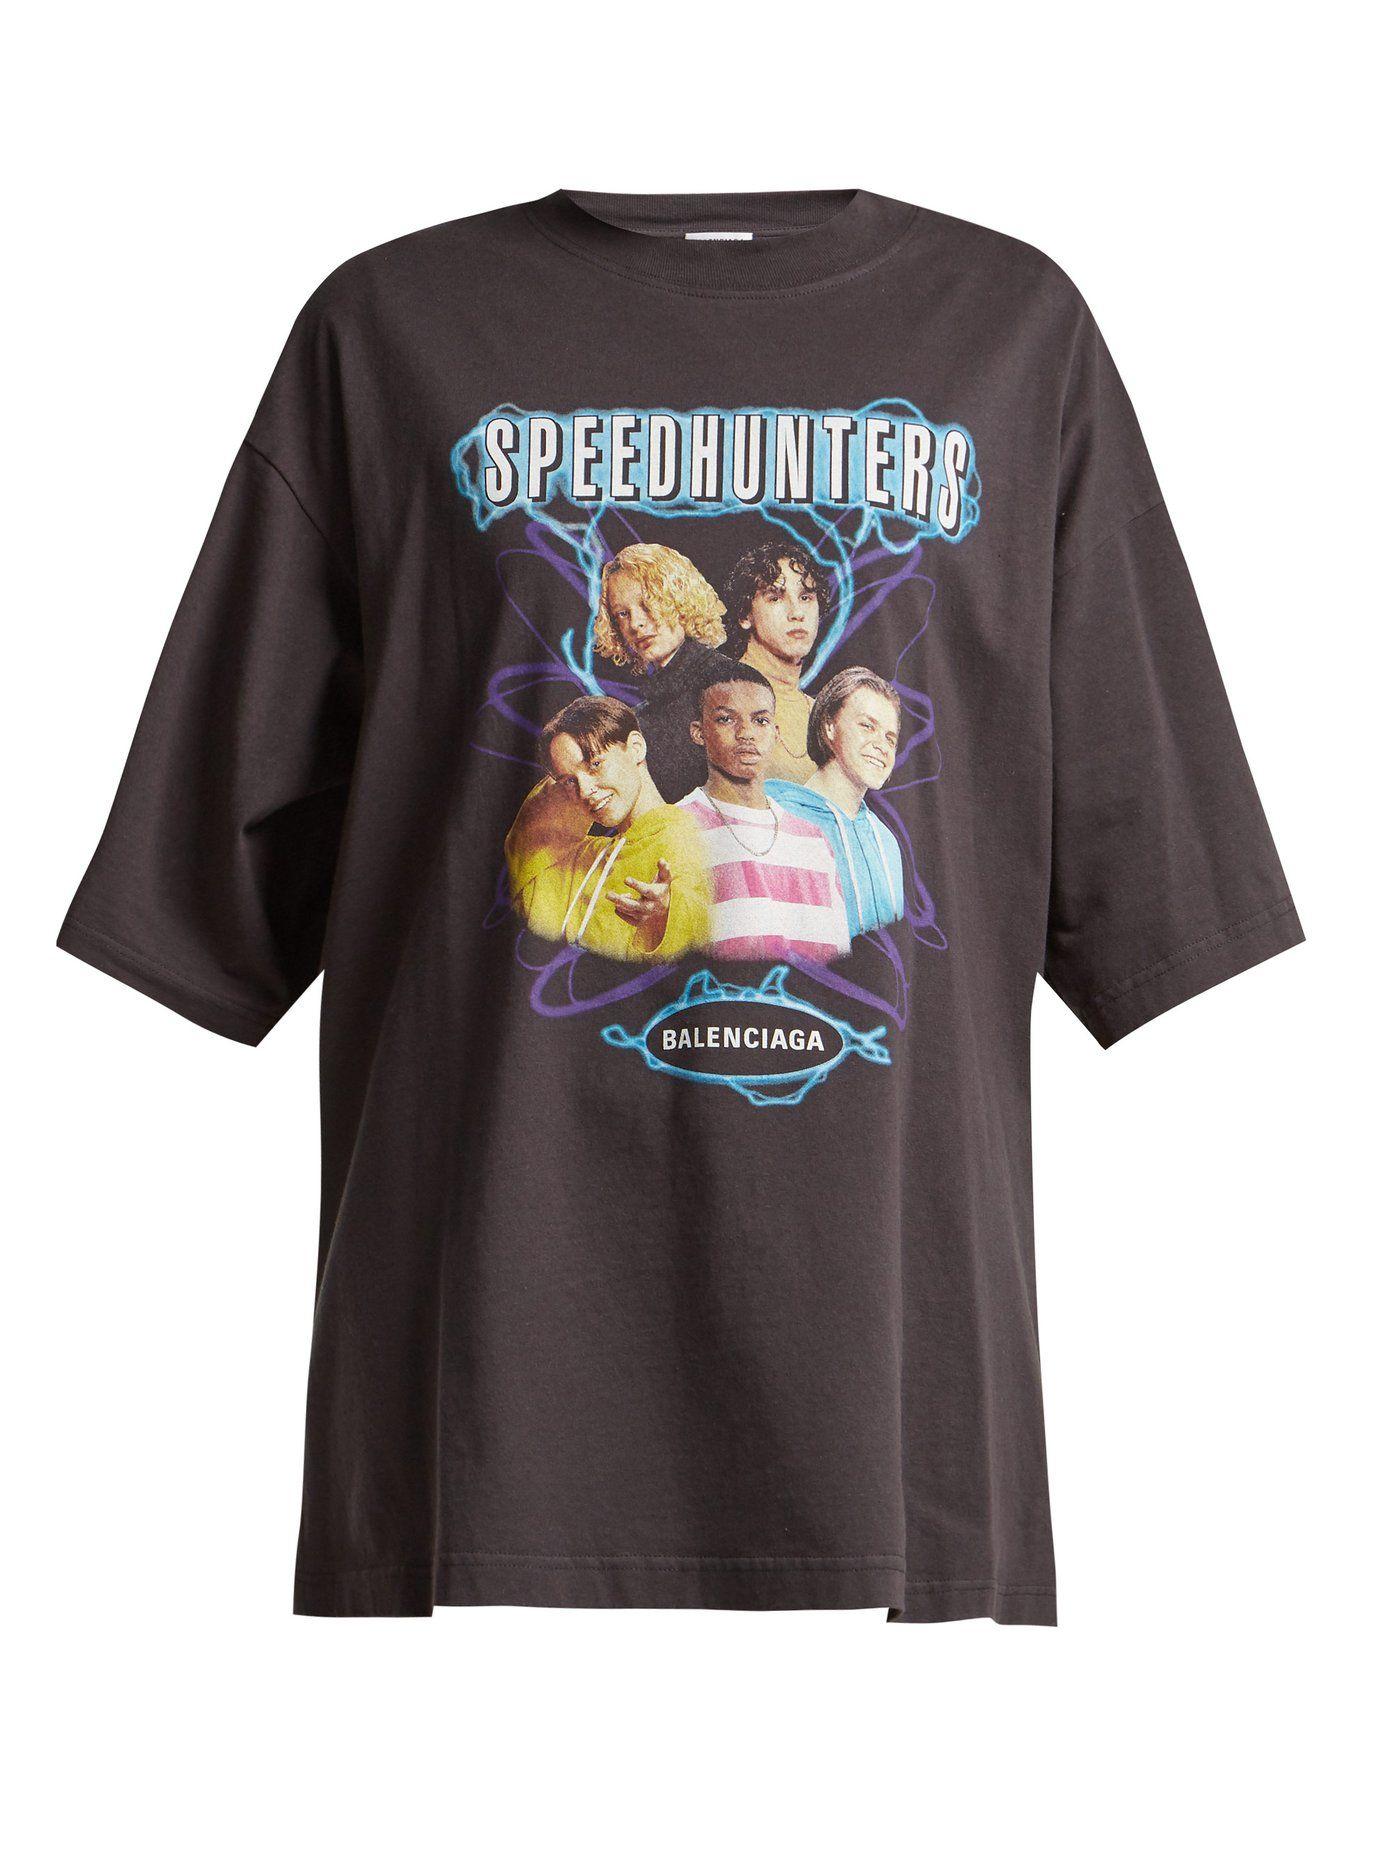 Speedhunter logoprint cottonjersey Tshirt Balenciaga